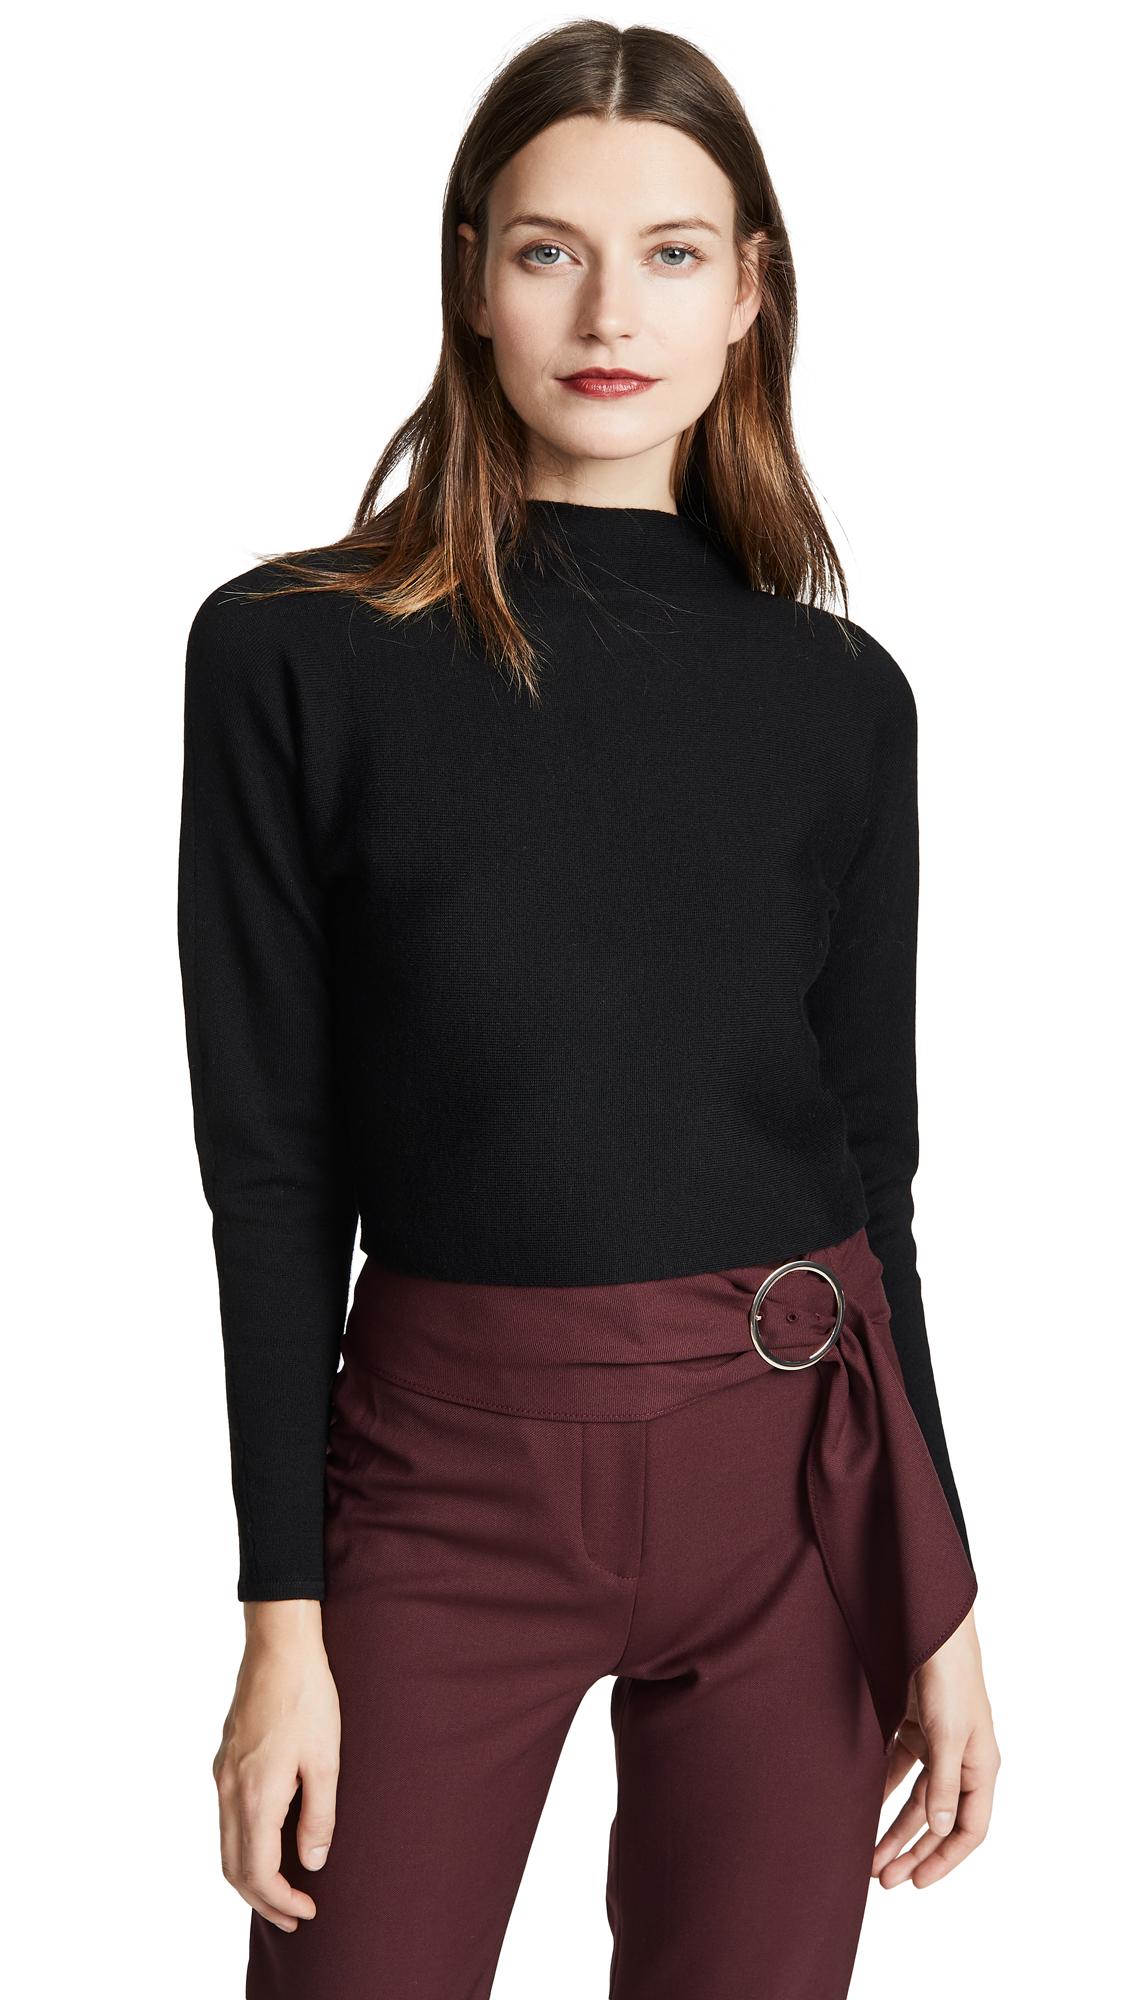 CLUB MONACO Vinchenda Mock-Neck Cropped Sweater in Black